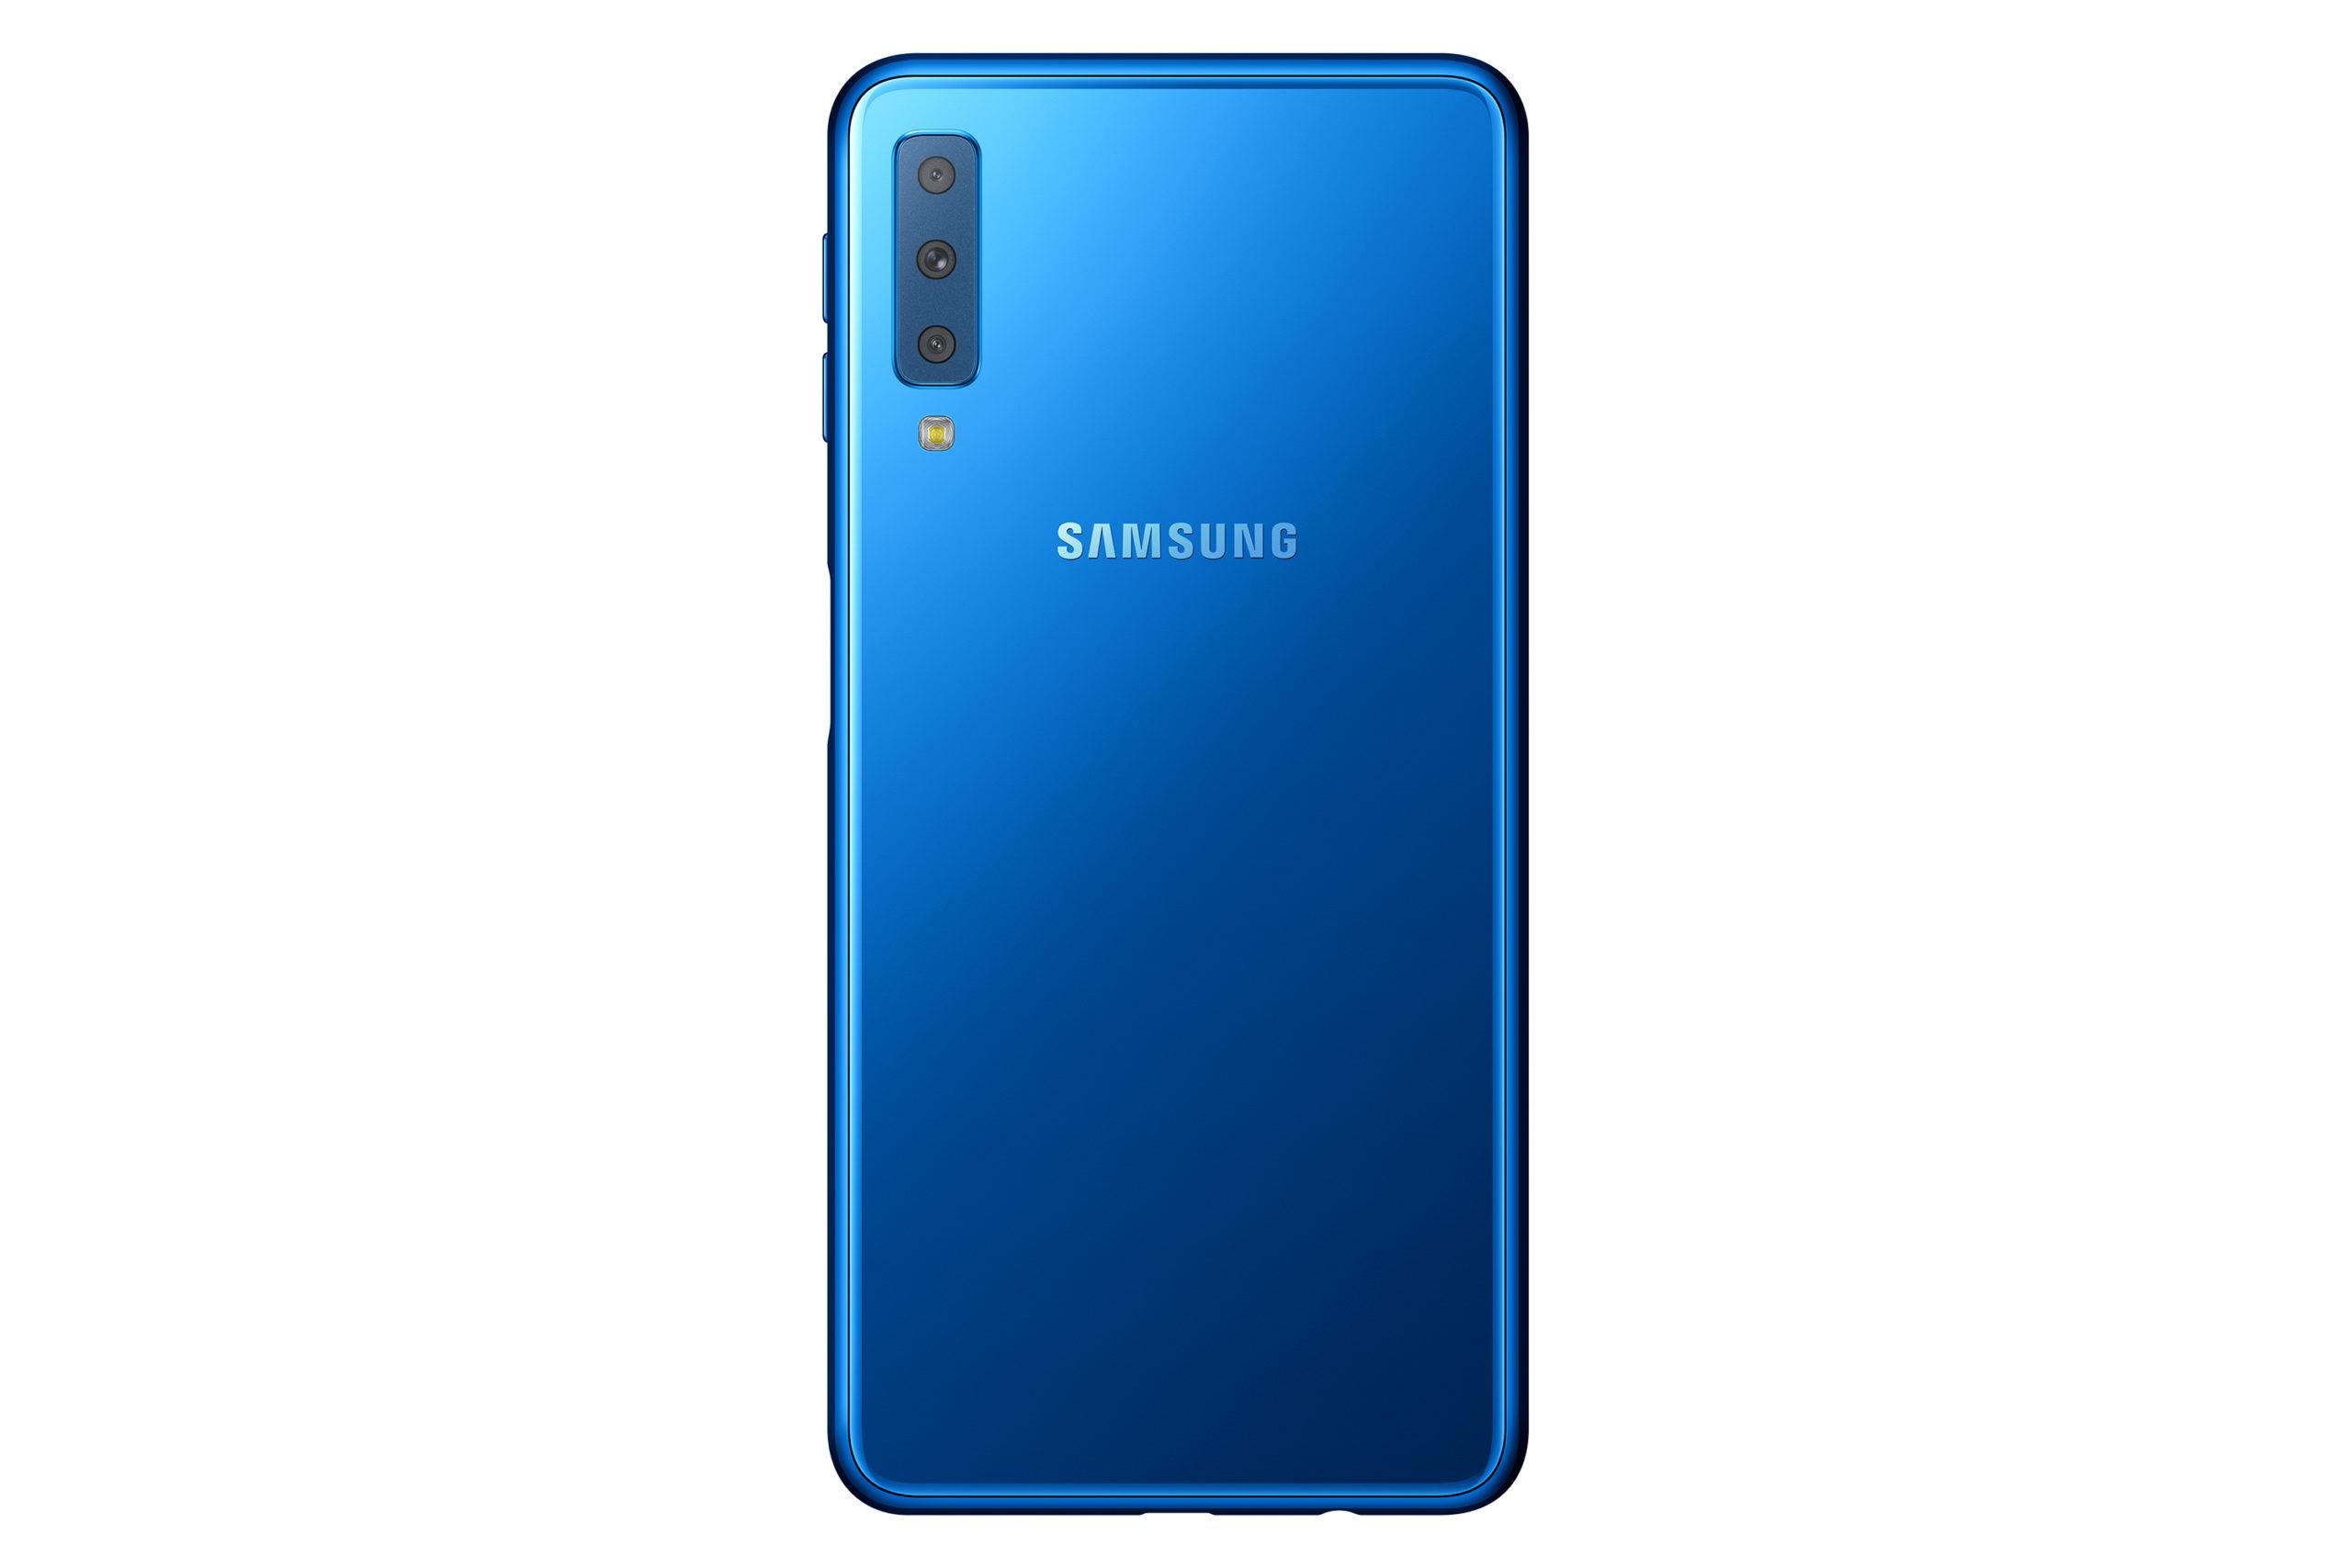 Samsung's Triple Lens Galaxy A7 starts selling in Kenya